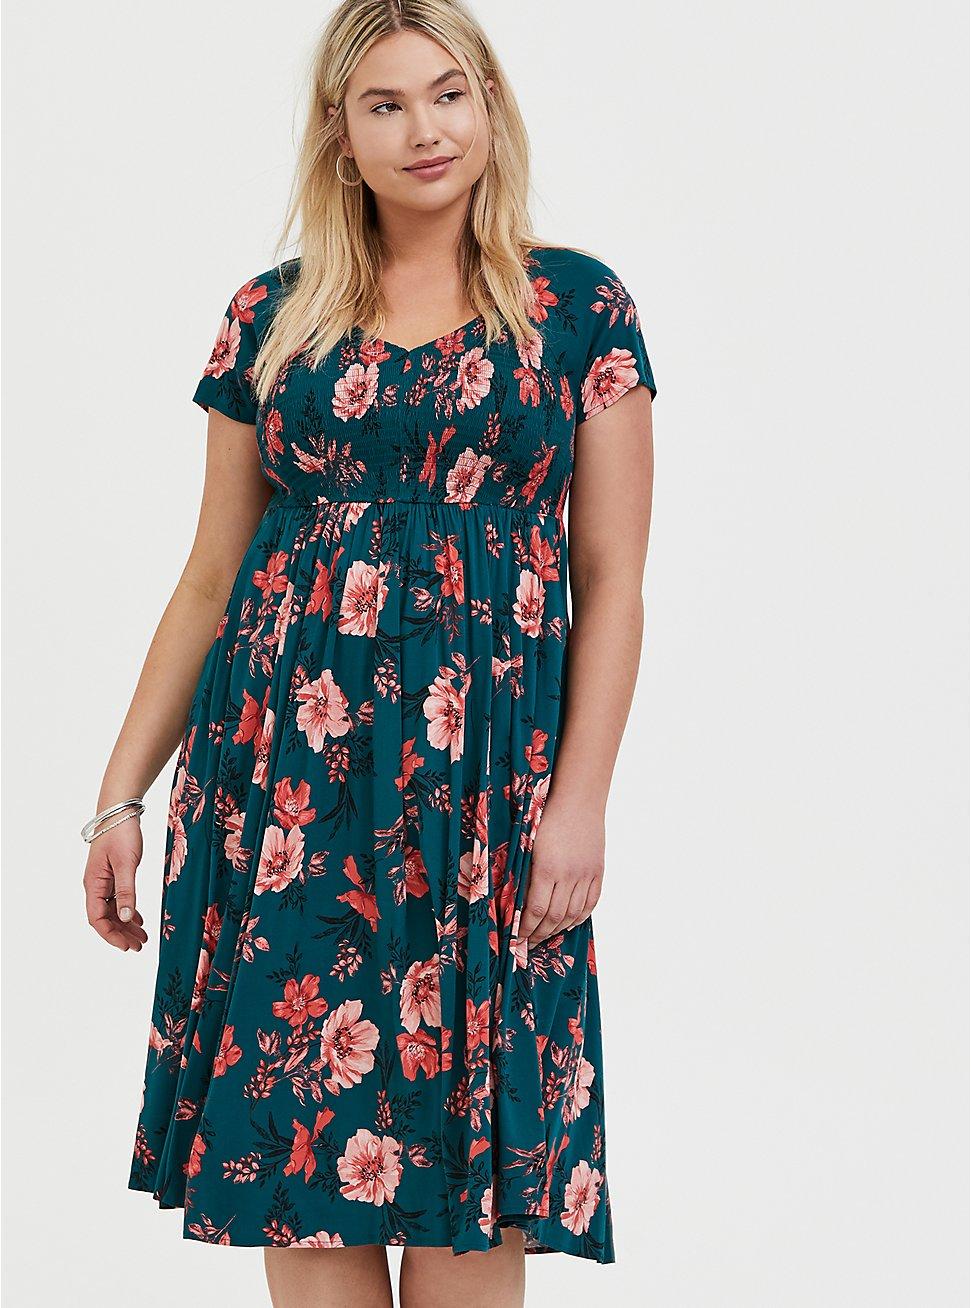 Dark Teal & Orange Floral Challis Smocked Midi Dress, FLORAL - TEAL, hi-res